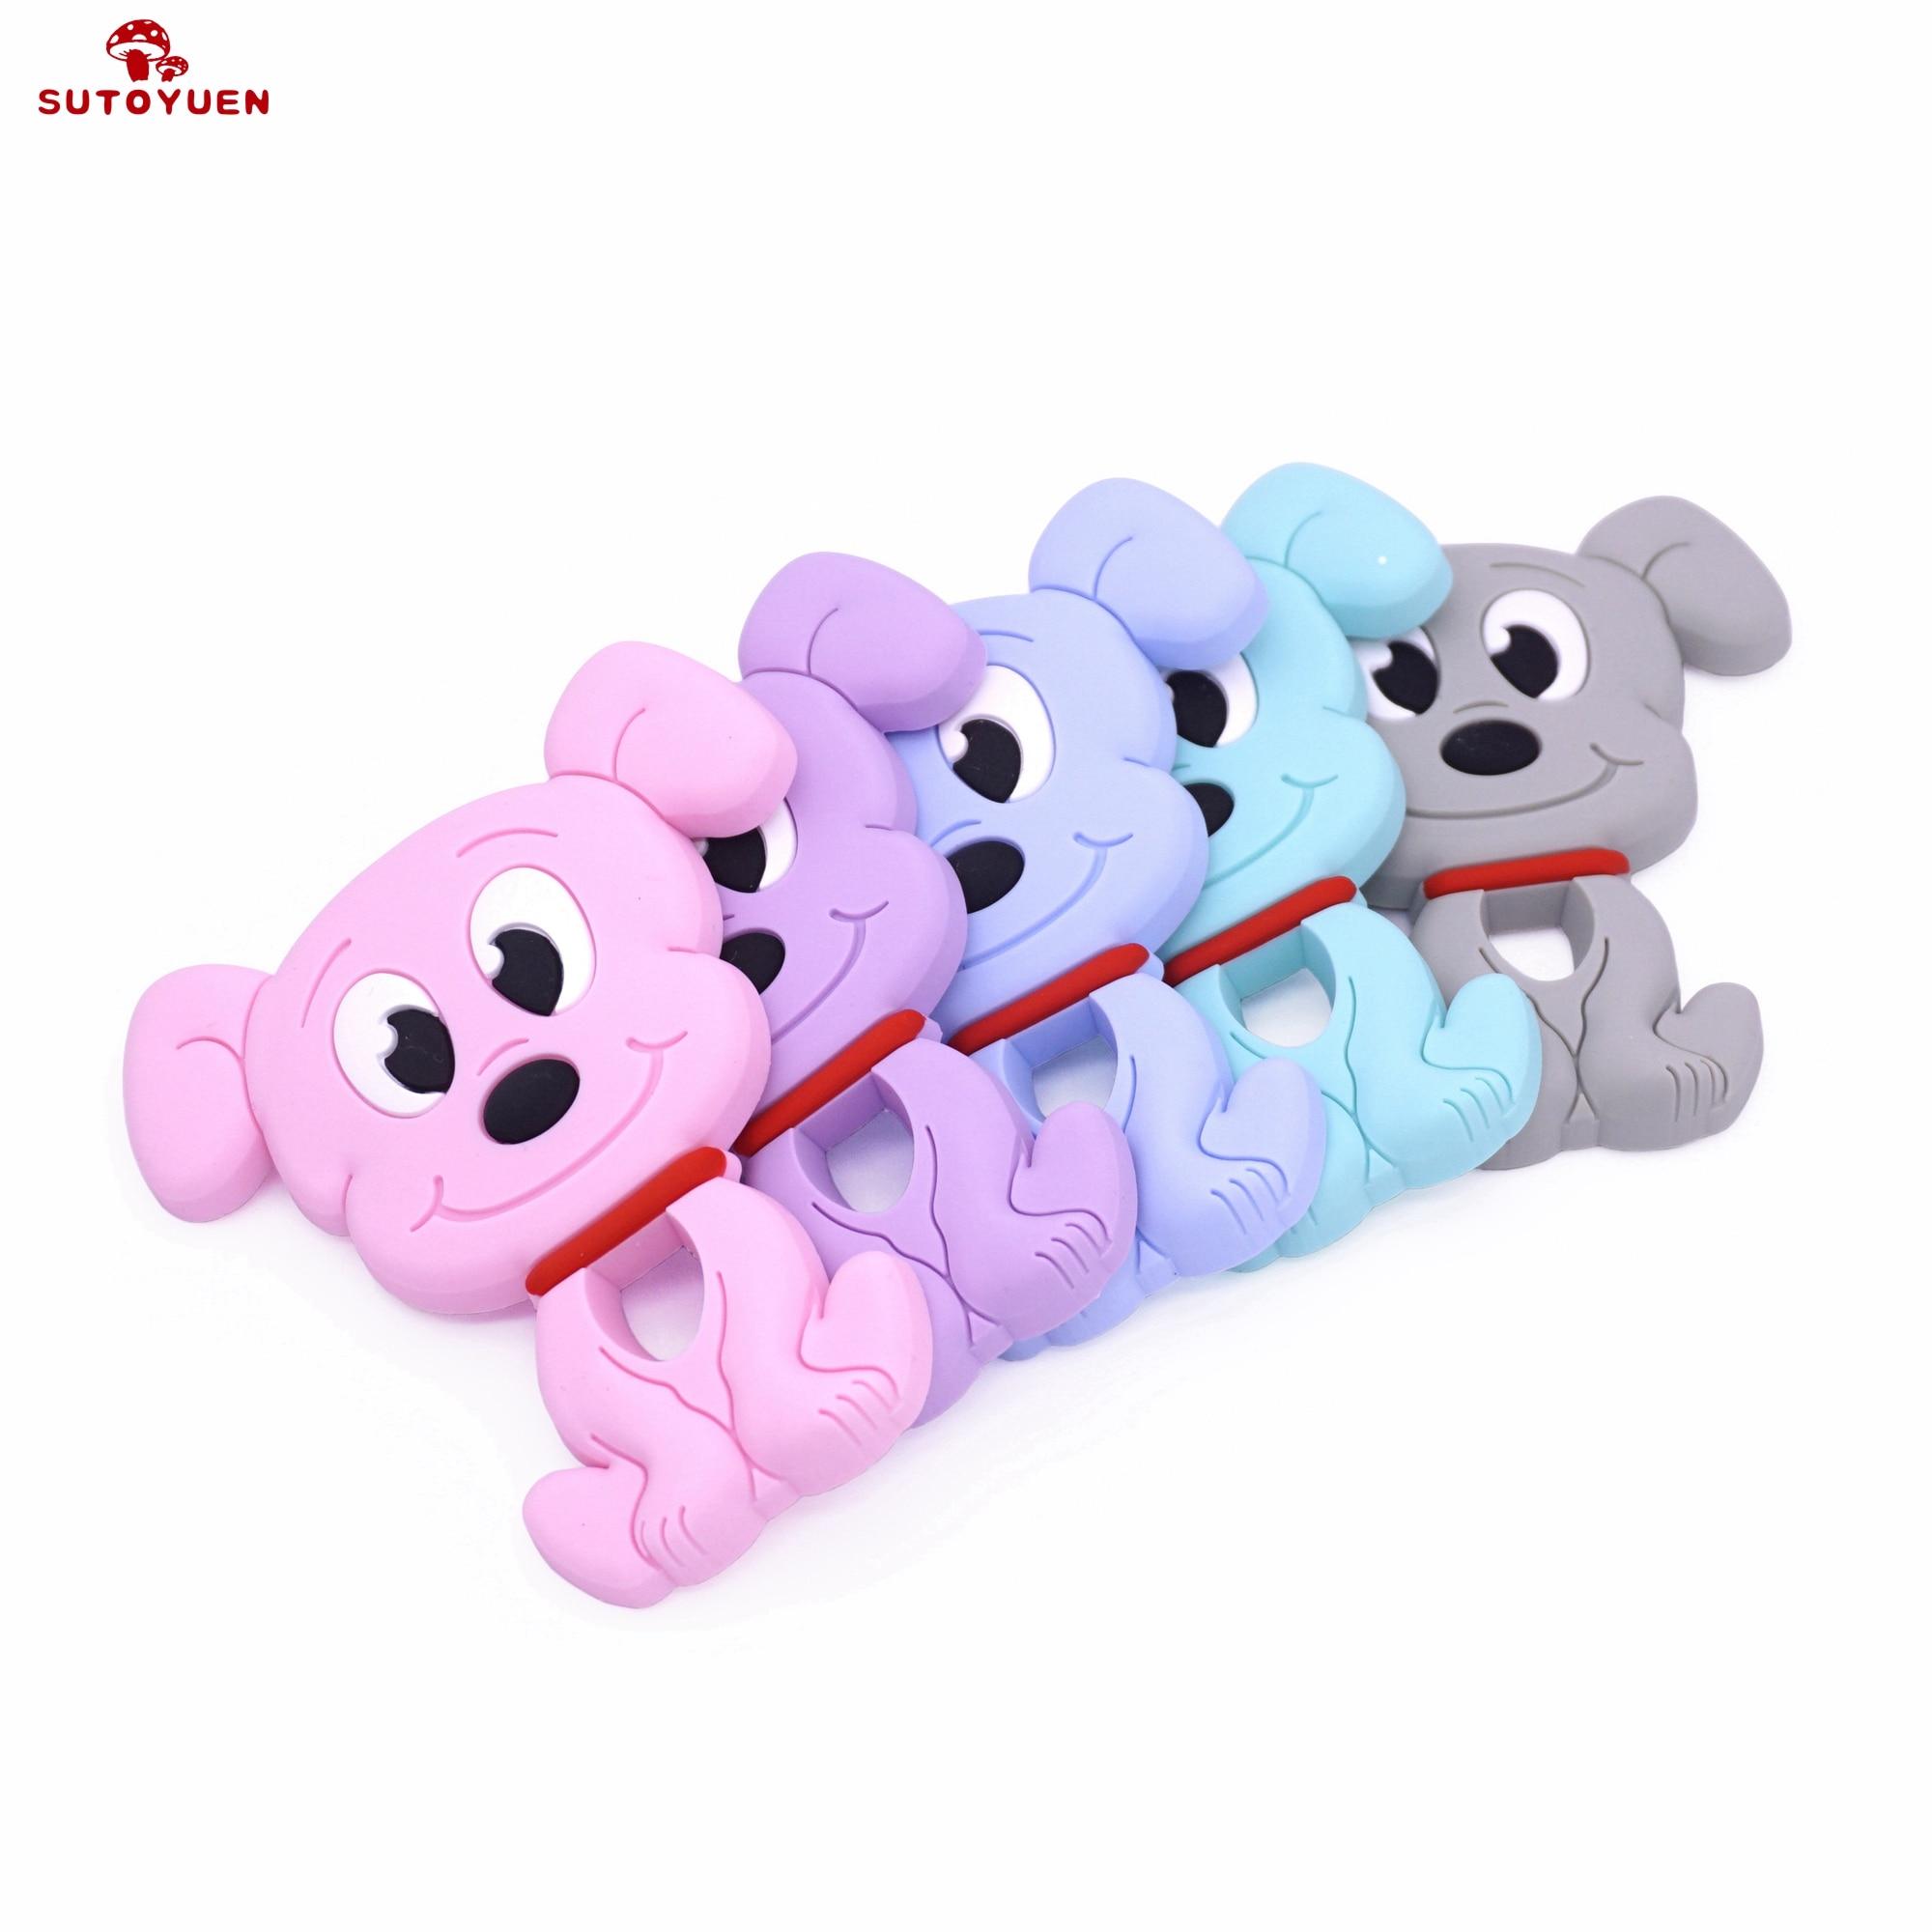 1pc Cartoon Dog Silicone Teether Cute Toys Chewable Animal Baby Product DIY Nursing Teething Pendant